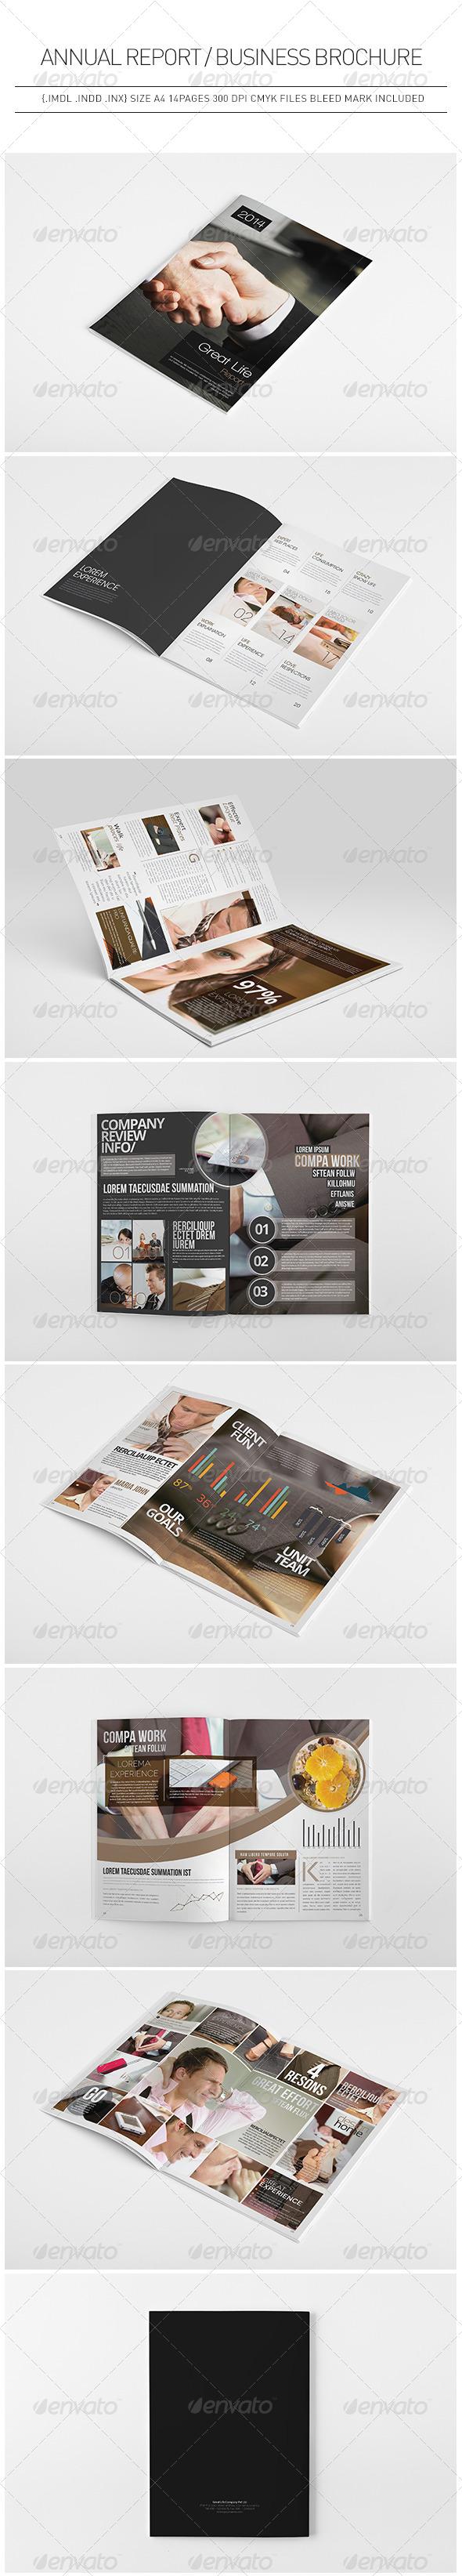 Annual Report / Business Brochure - Corporate Brochures